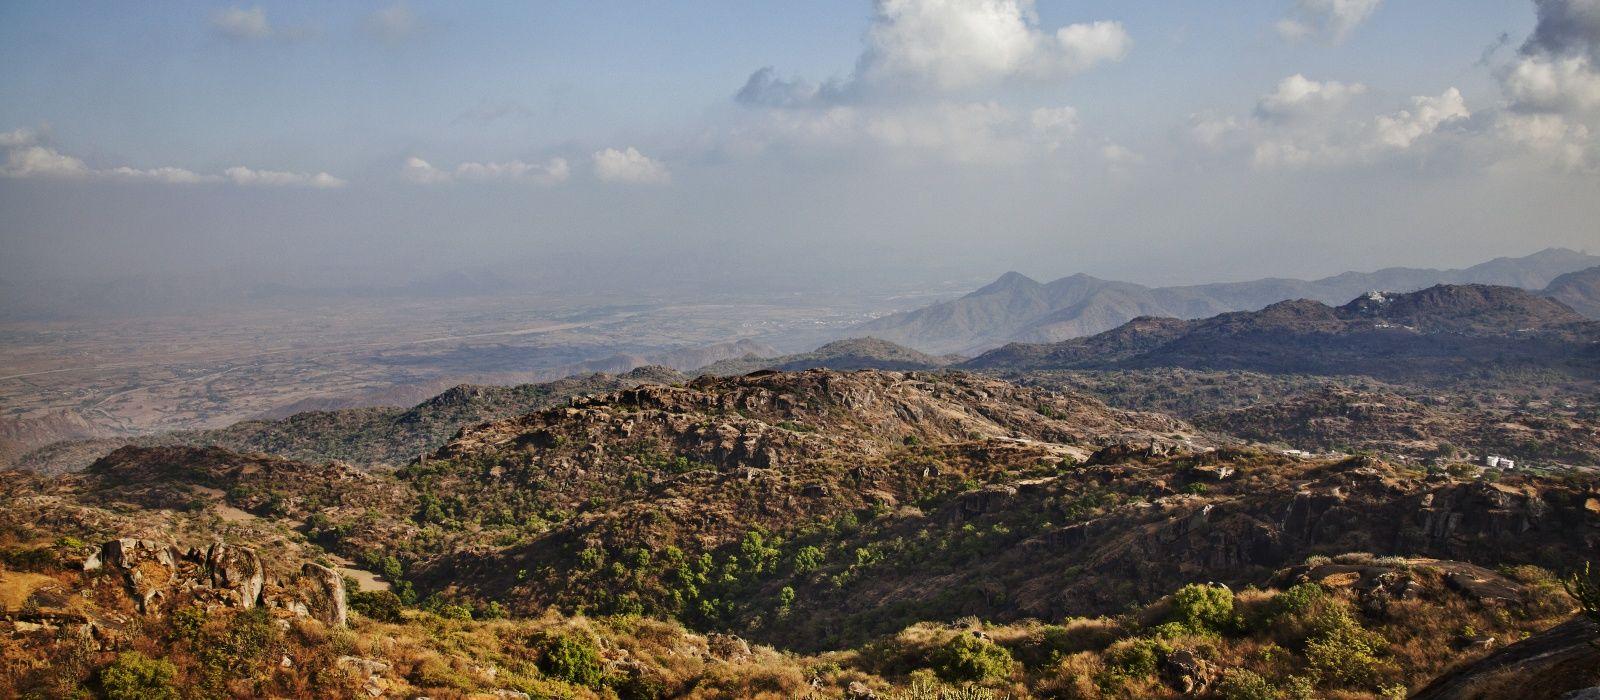 Destination Mount Abu North India